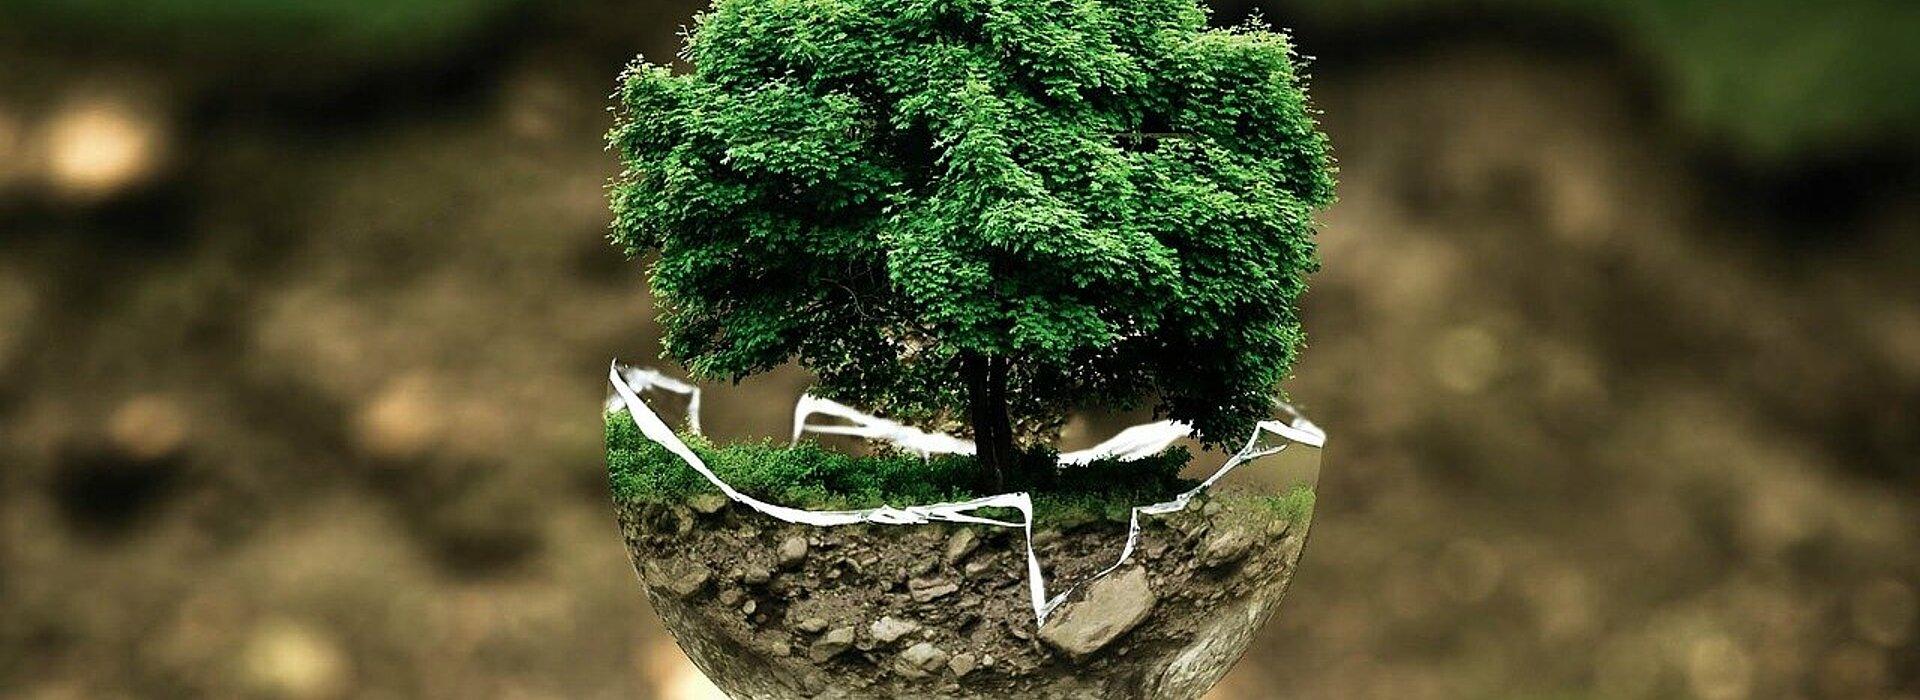 Árvore centralizada.